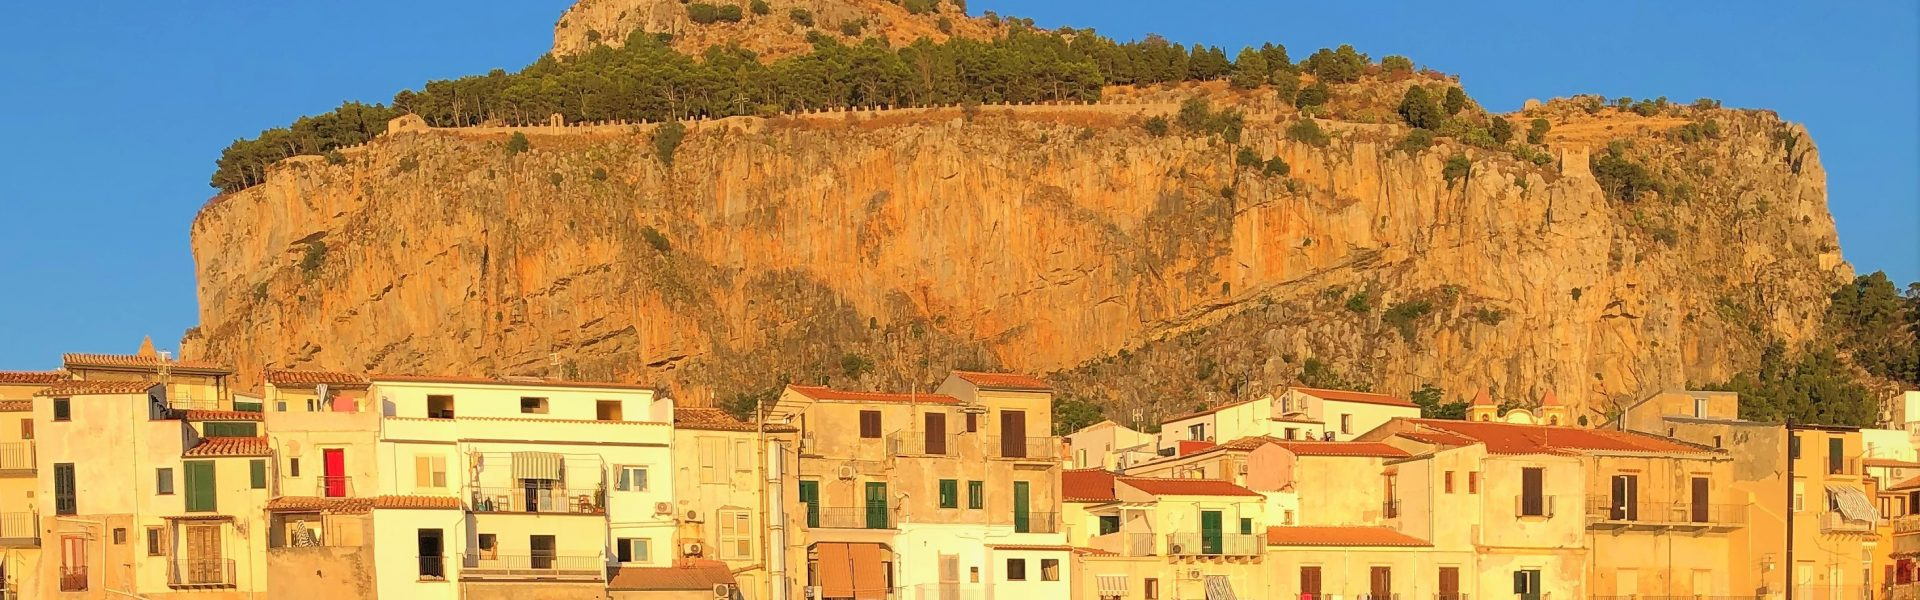 Rocca di Cefalù in Sicilia